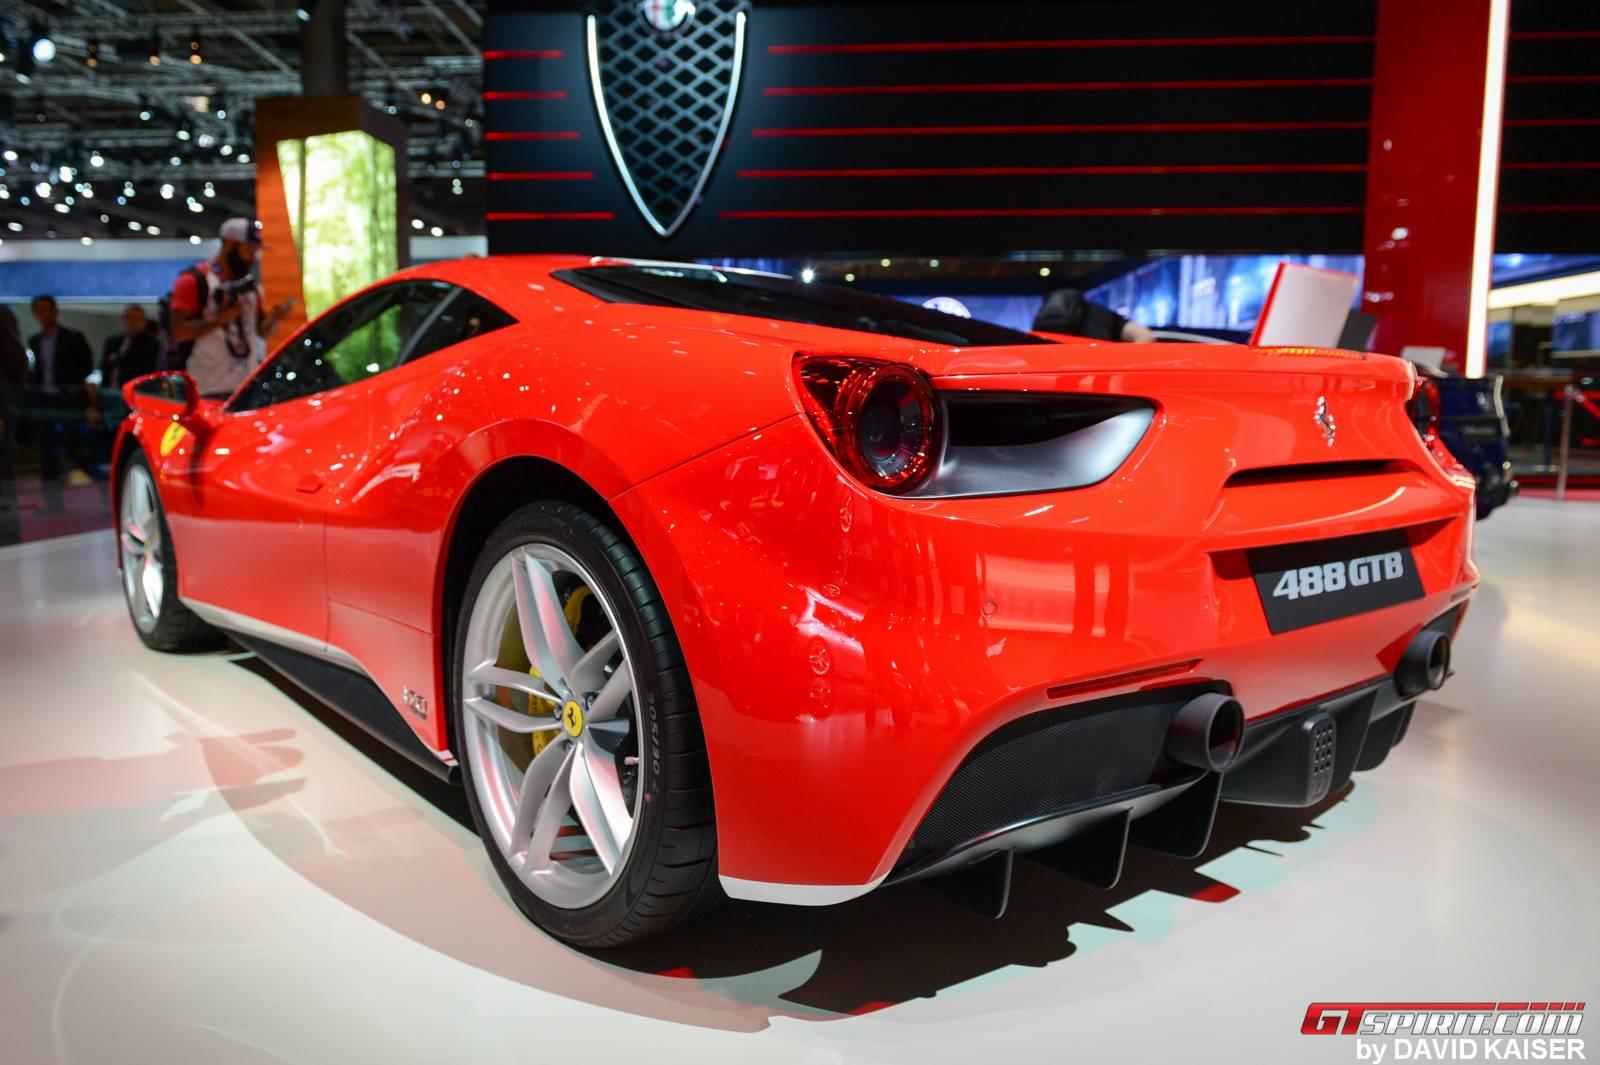 Paris 2016 Ferrari 488 GTB The Schumacher GTspirit